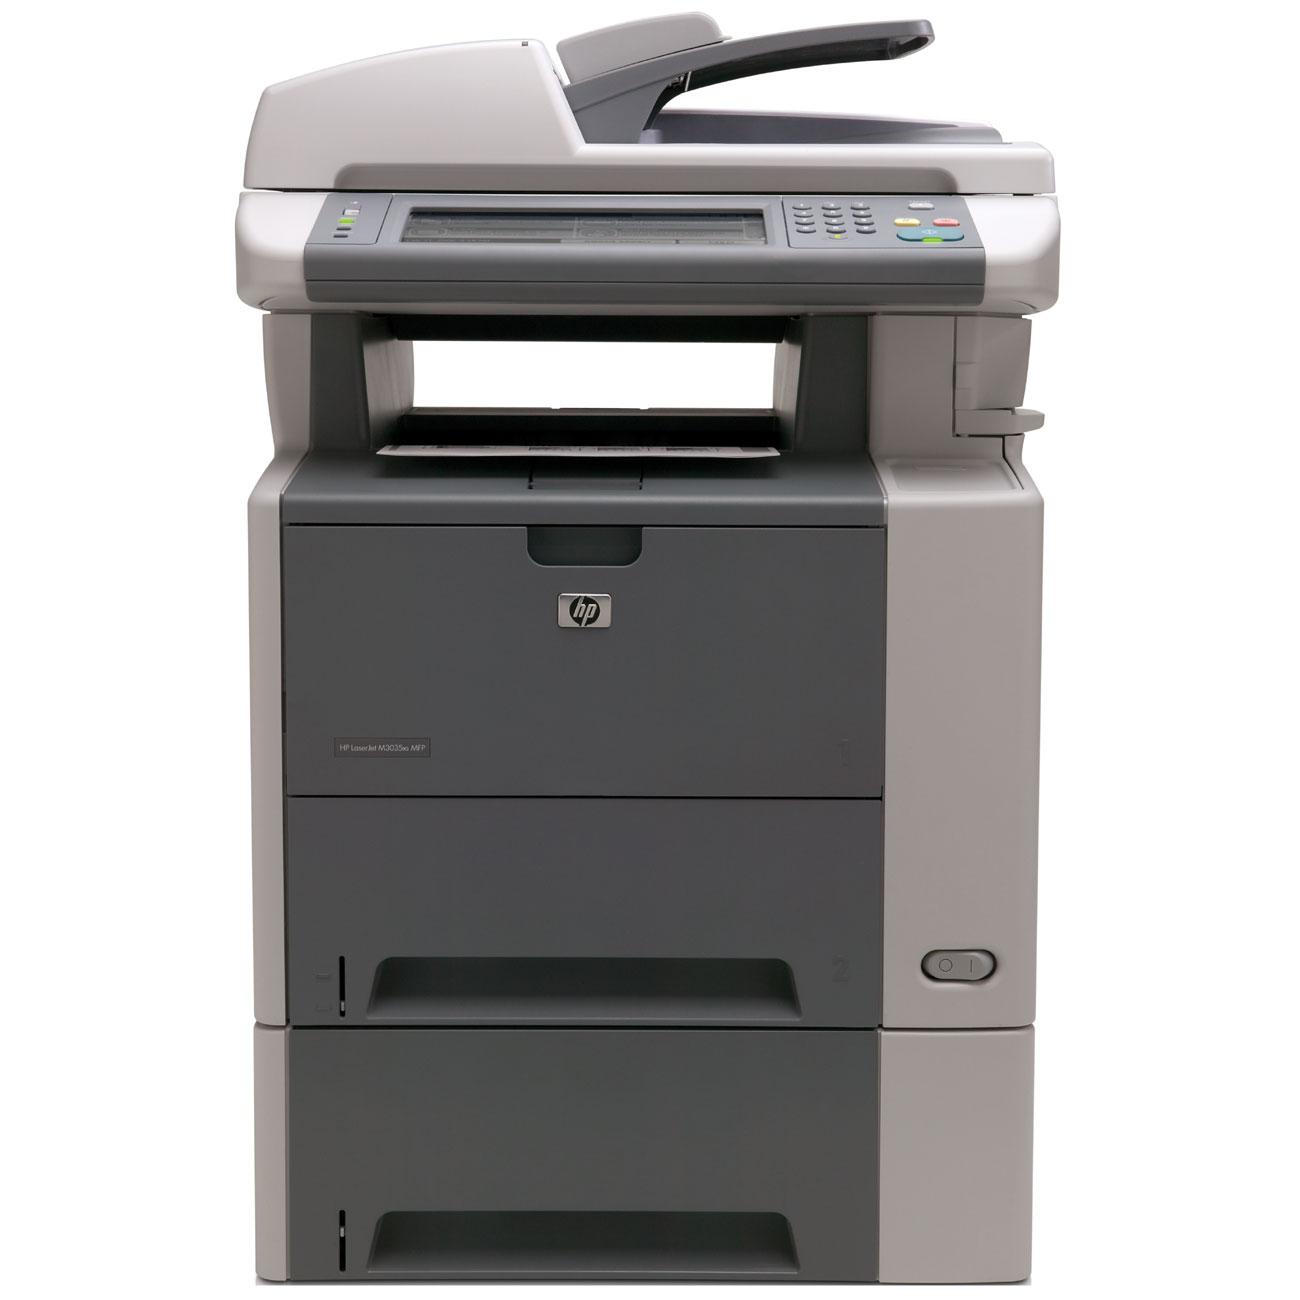 HP LaserJet M3035XS Laser Multifunction Printer - Monochrome - Plain Paper Print - Floor Standing - Copier/Fax/Printer/Scanner - 35 ppm Mono Print - 1200 x 1200 dpi Print - Automatic Duplex Print - 35 cpm Mono Copy - 1 x Input Tray 500 Sheet, 1 x Multipur 0